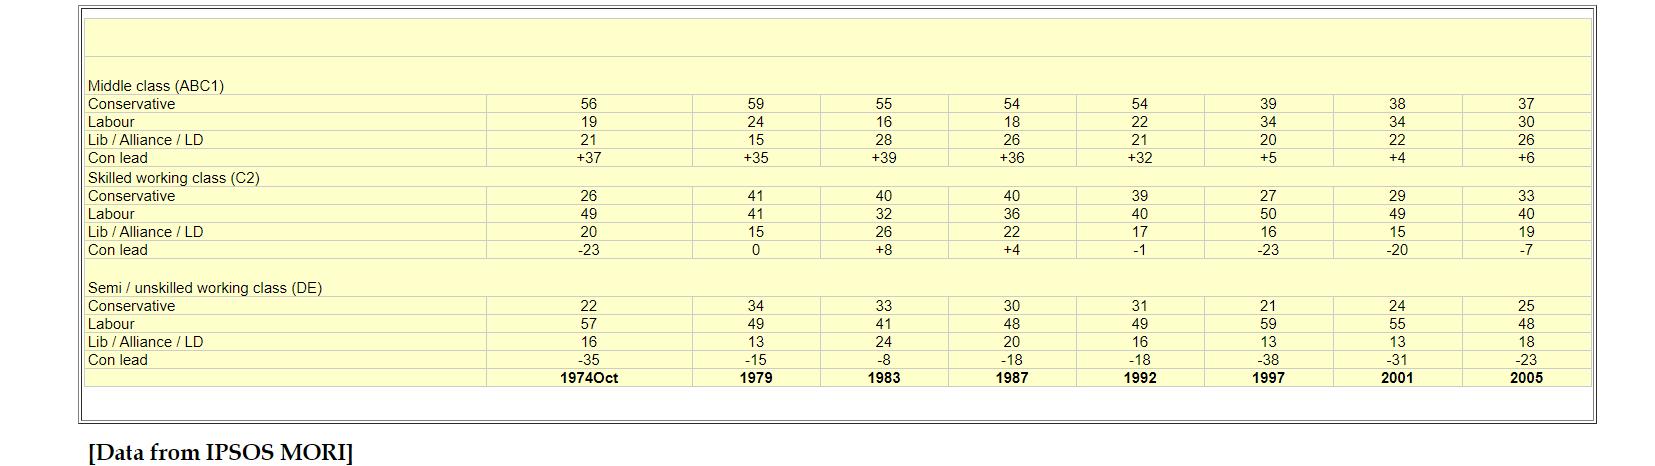 Electioncomp970105-IPSOS-MORI-DATA.